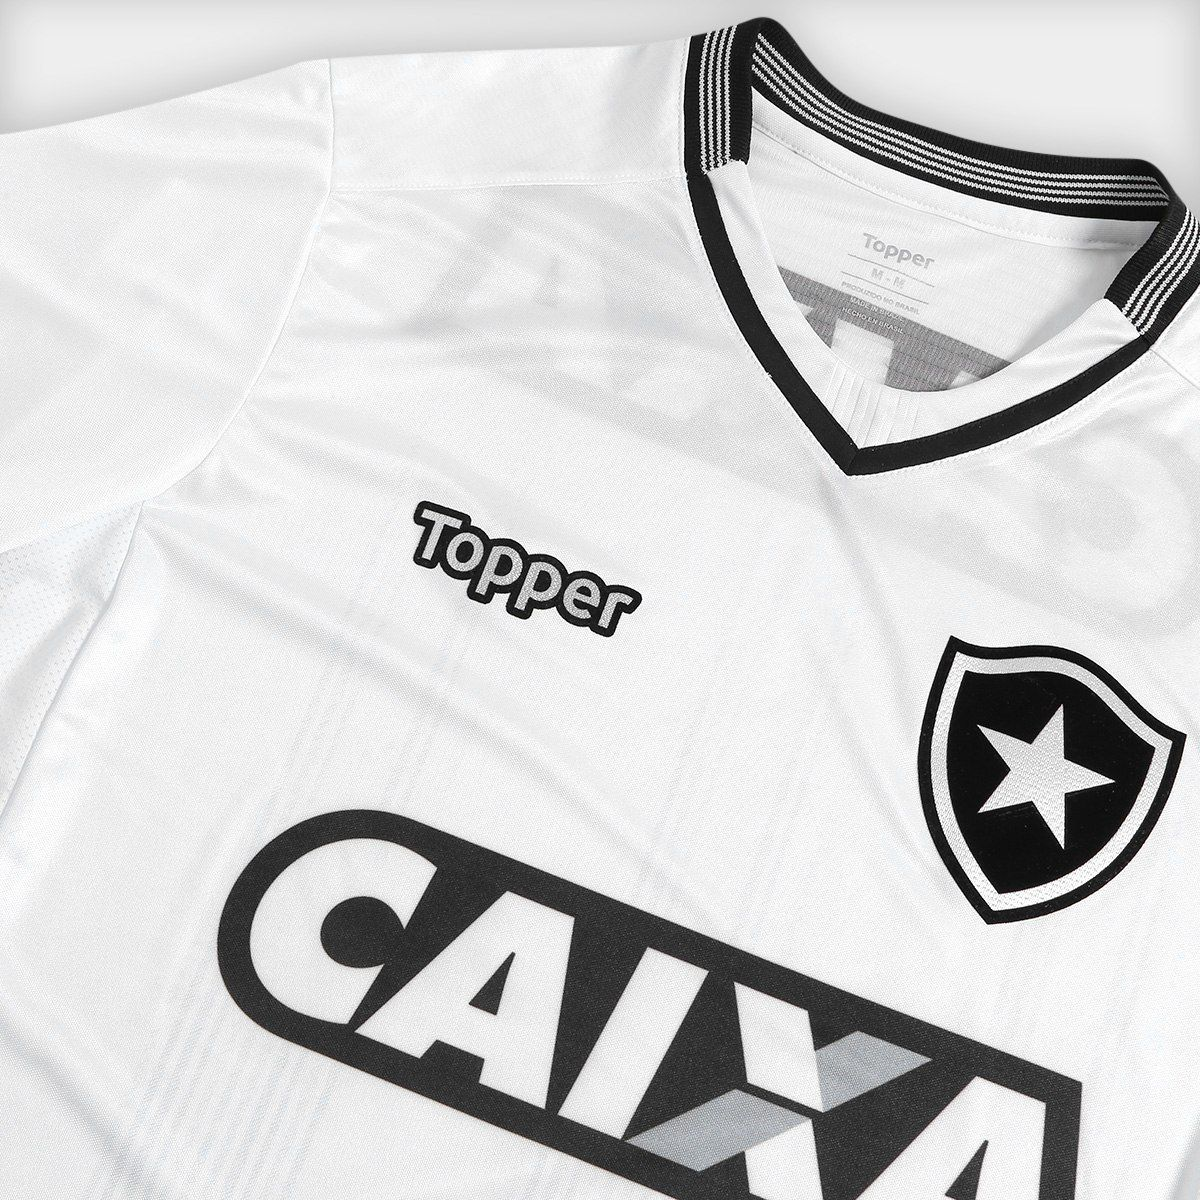 a2588f816c Camisa Masculina Botafogo 2018 - Topper